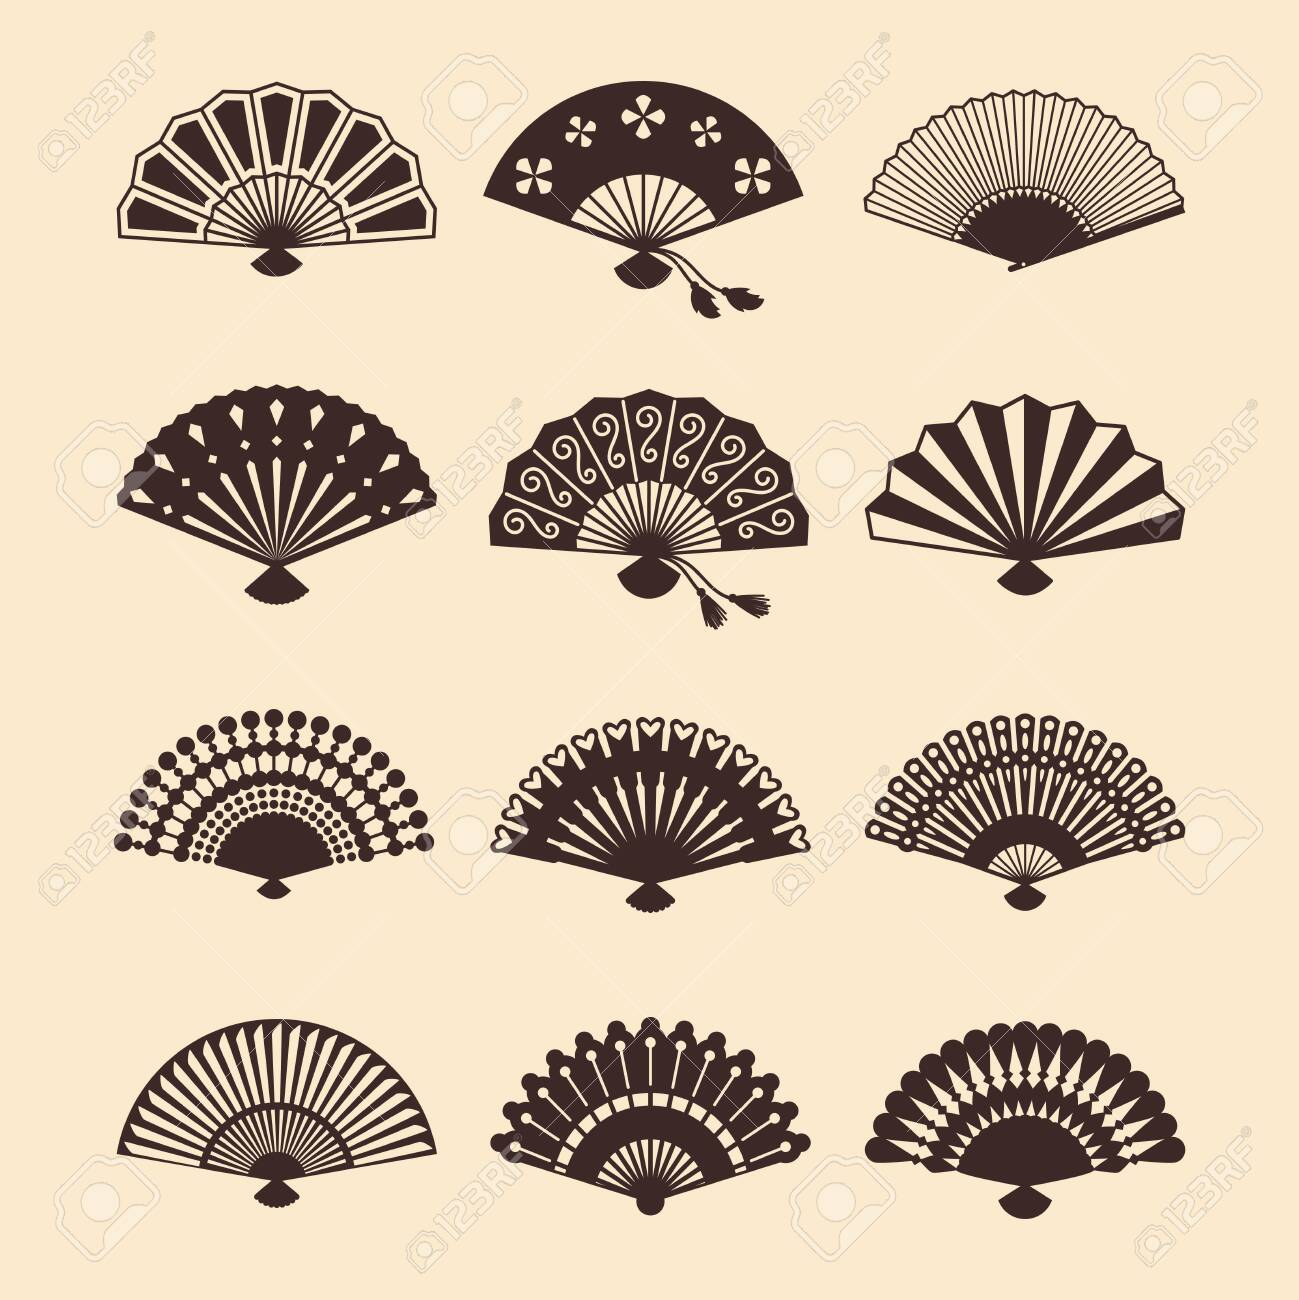 Vintage elegant oriental fans of set vector silhouettes. Oriental fan chinese, decoration japanese souvenir illustration - 130828603